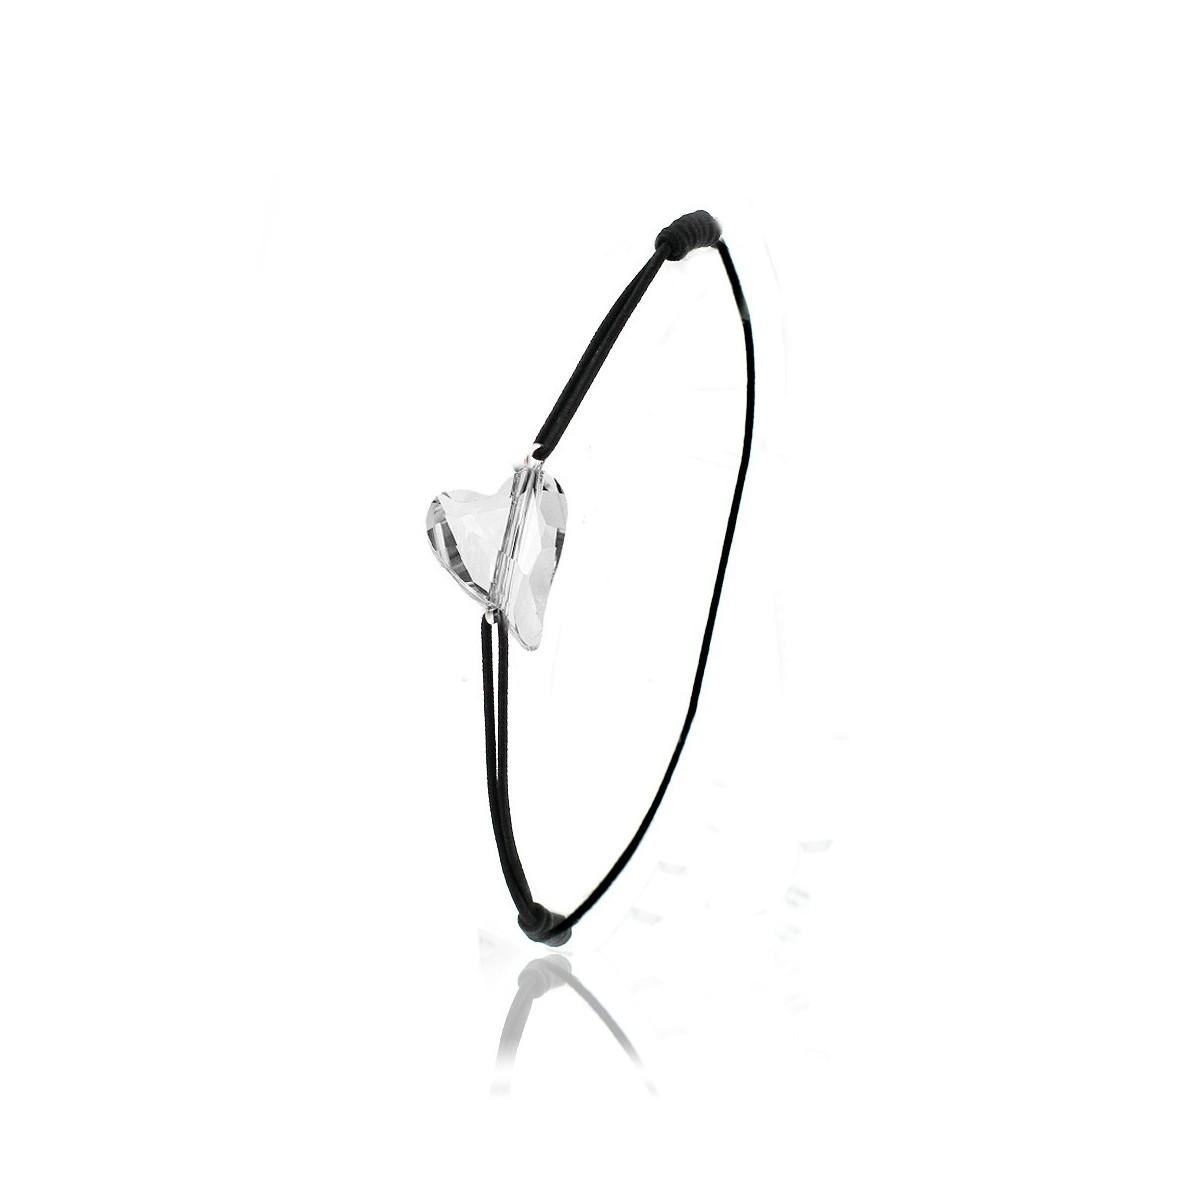 Bracelet élastique noir So Charm made with Crystal from Swarovski